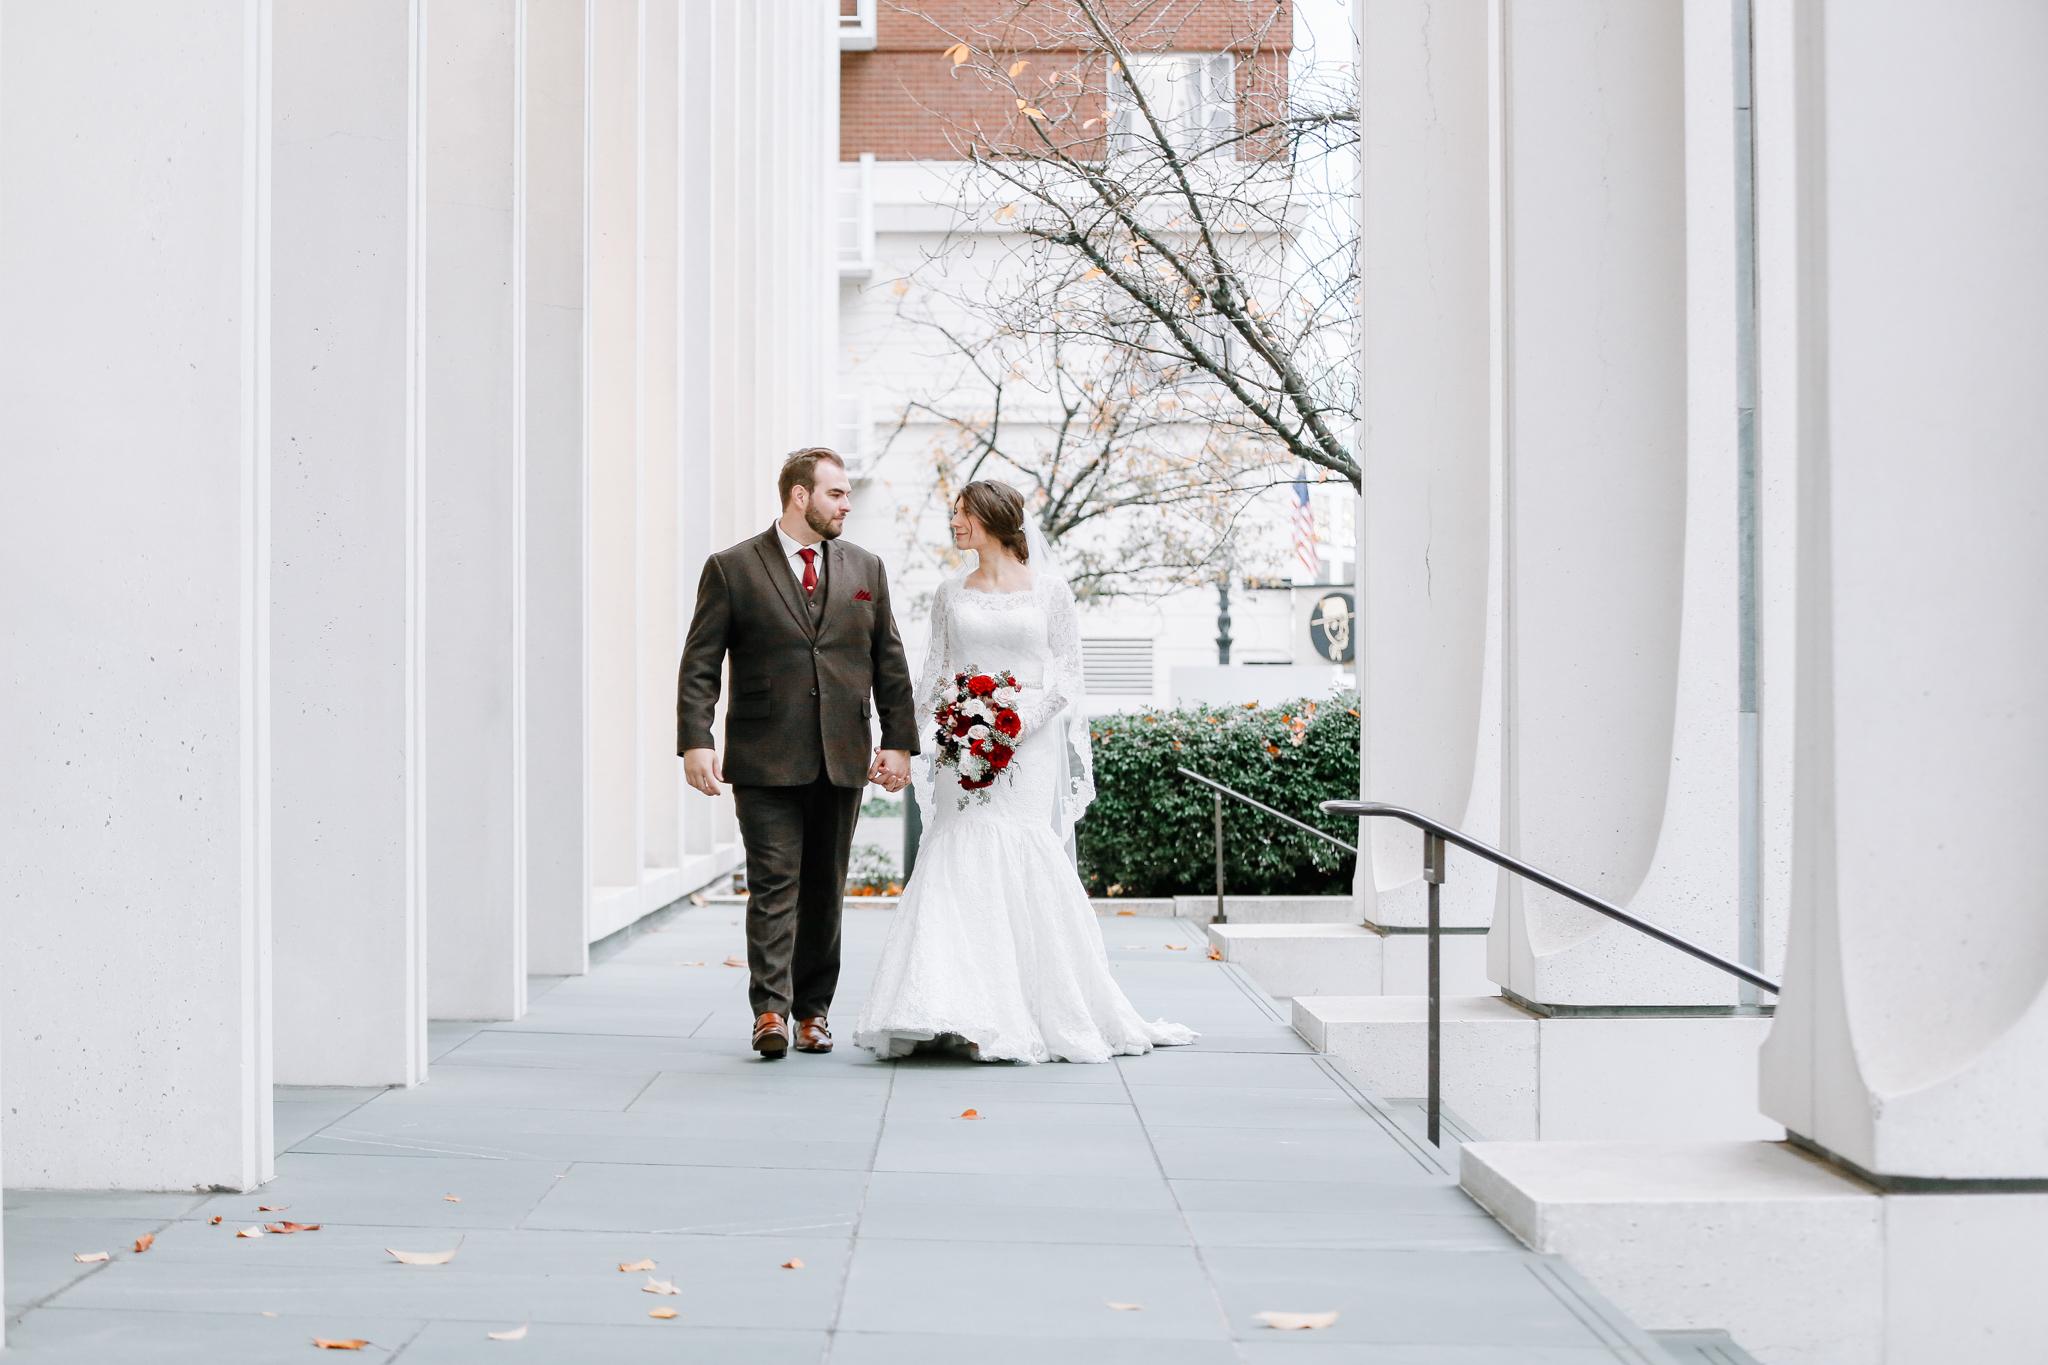 Manu and Laura - Portland Wedding Photographer - 81.jpg